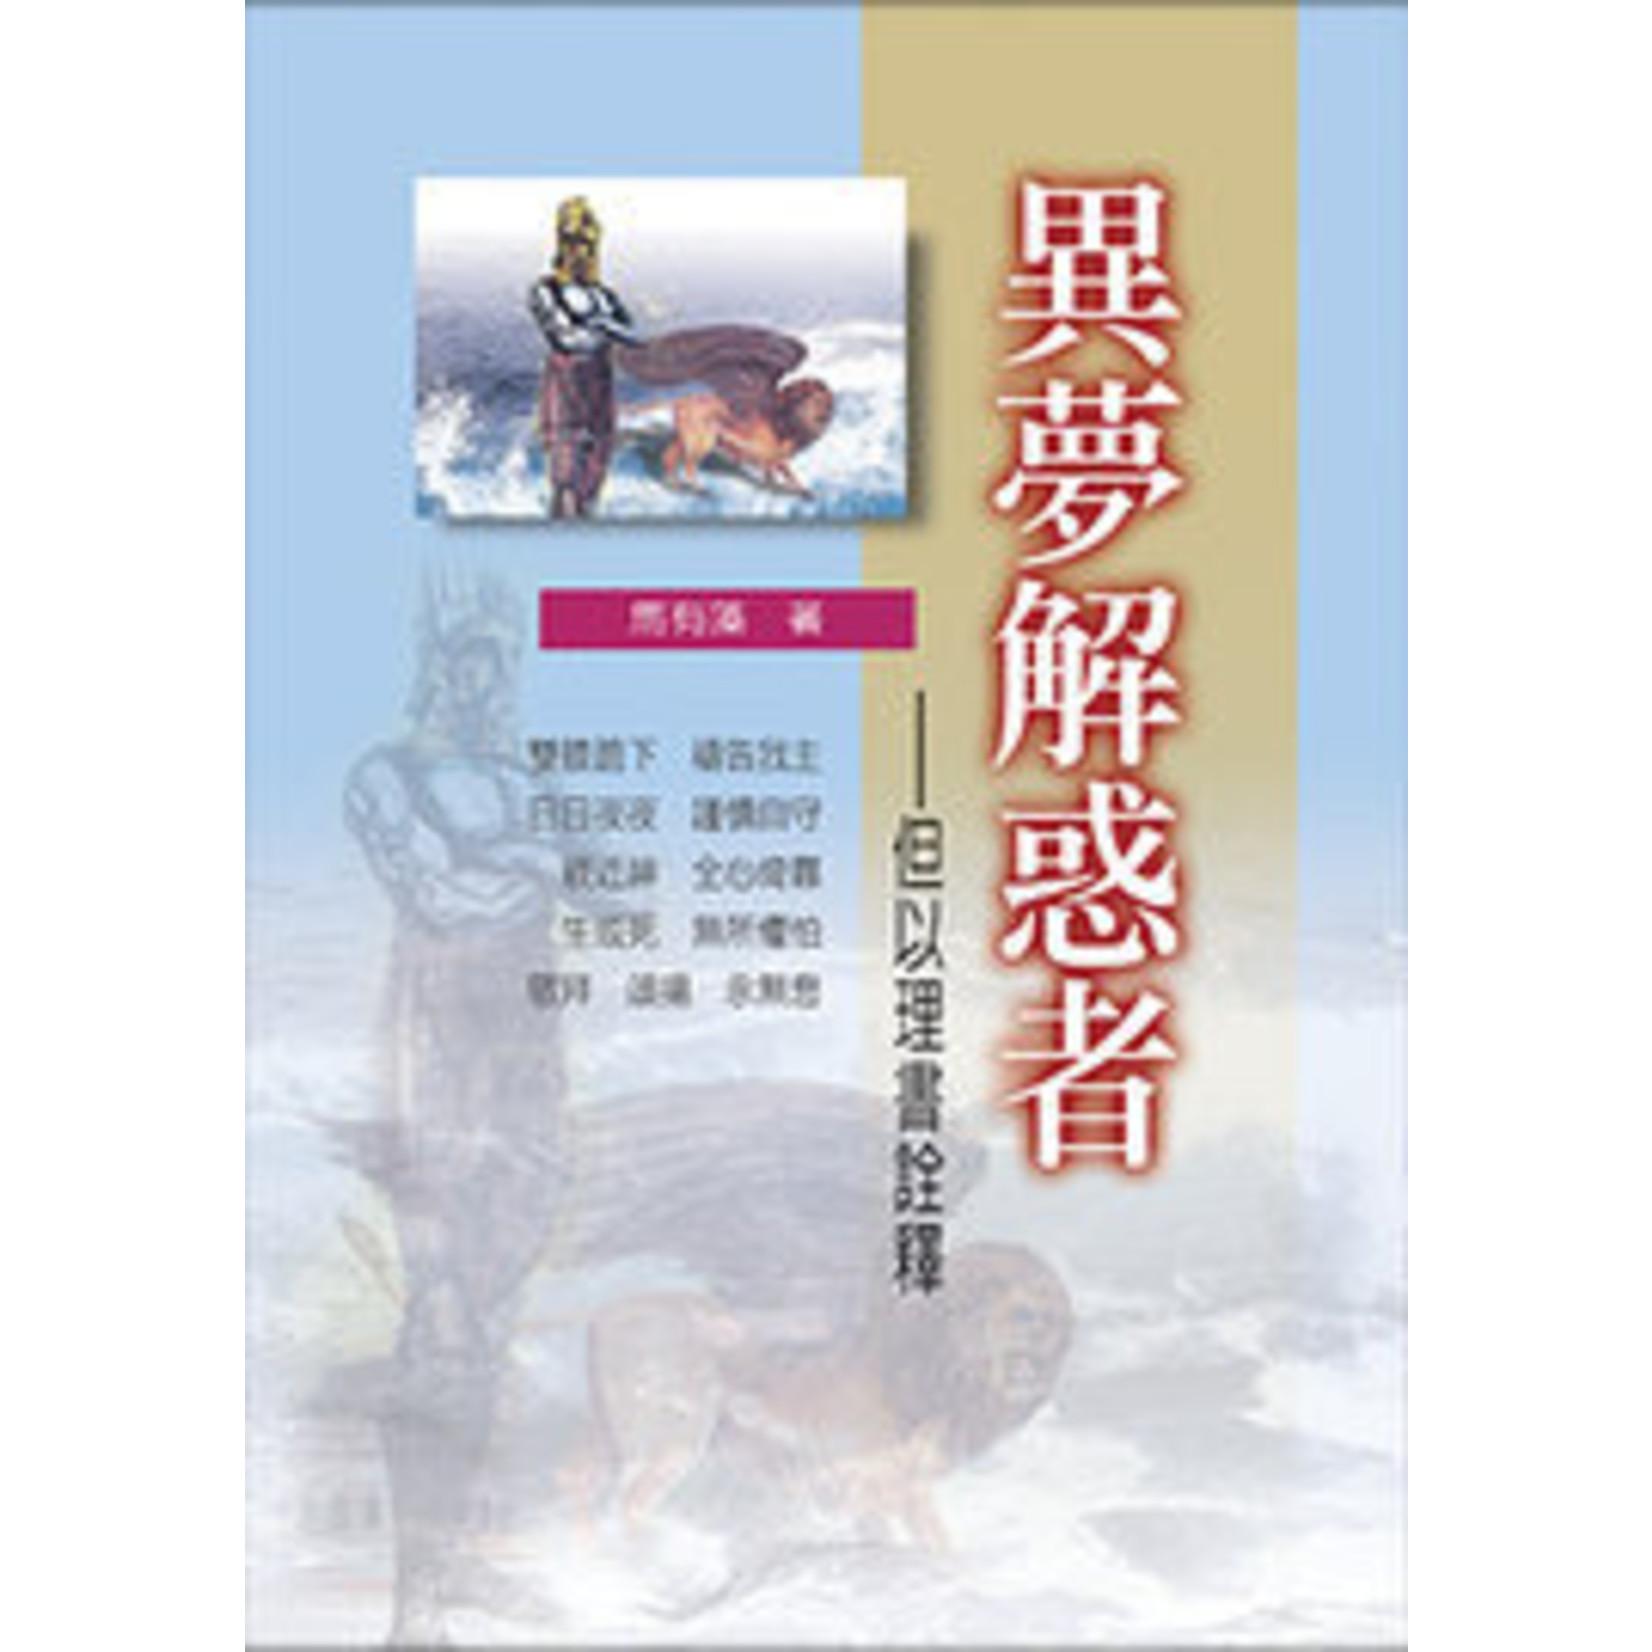 華人基督徒培訓供應中心 Chinese Christian Training Resources Center 異夢解惑者:但以理書詮釋